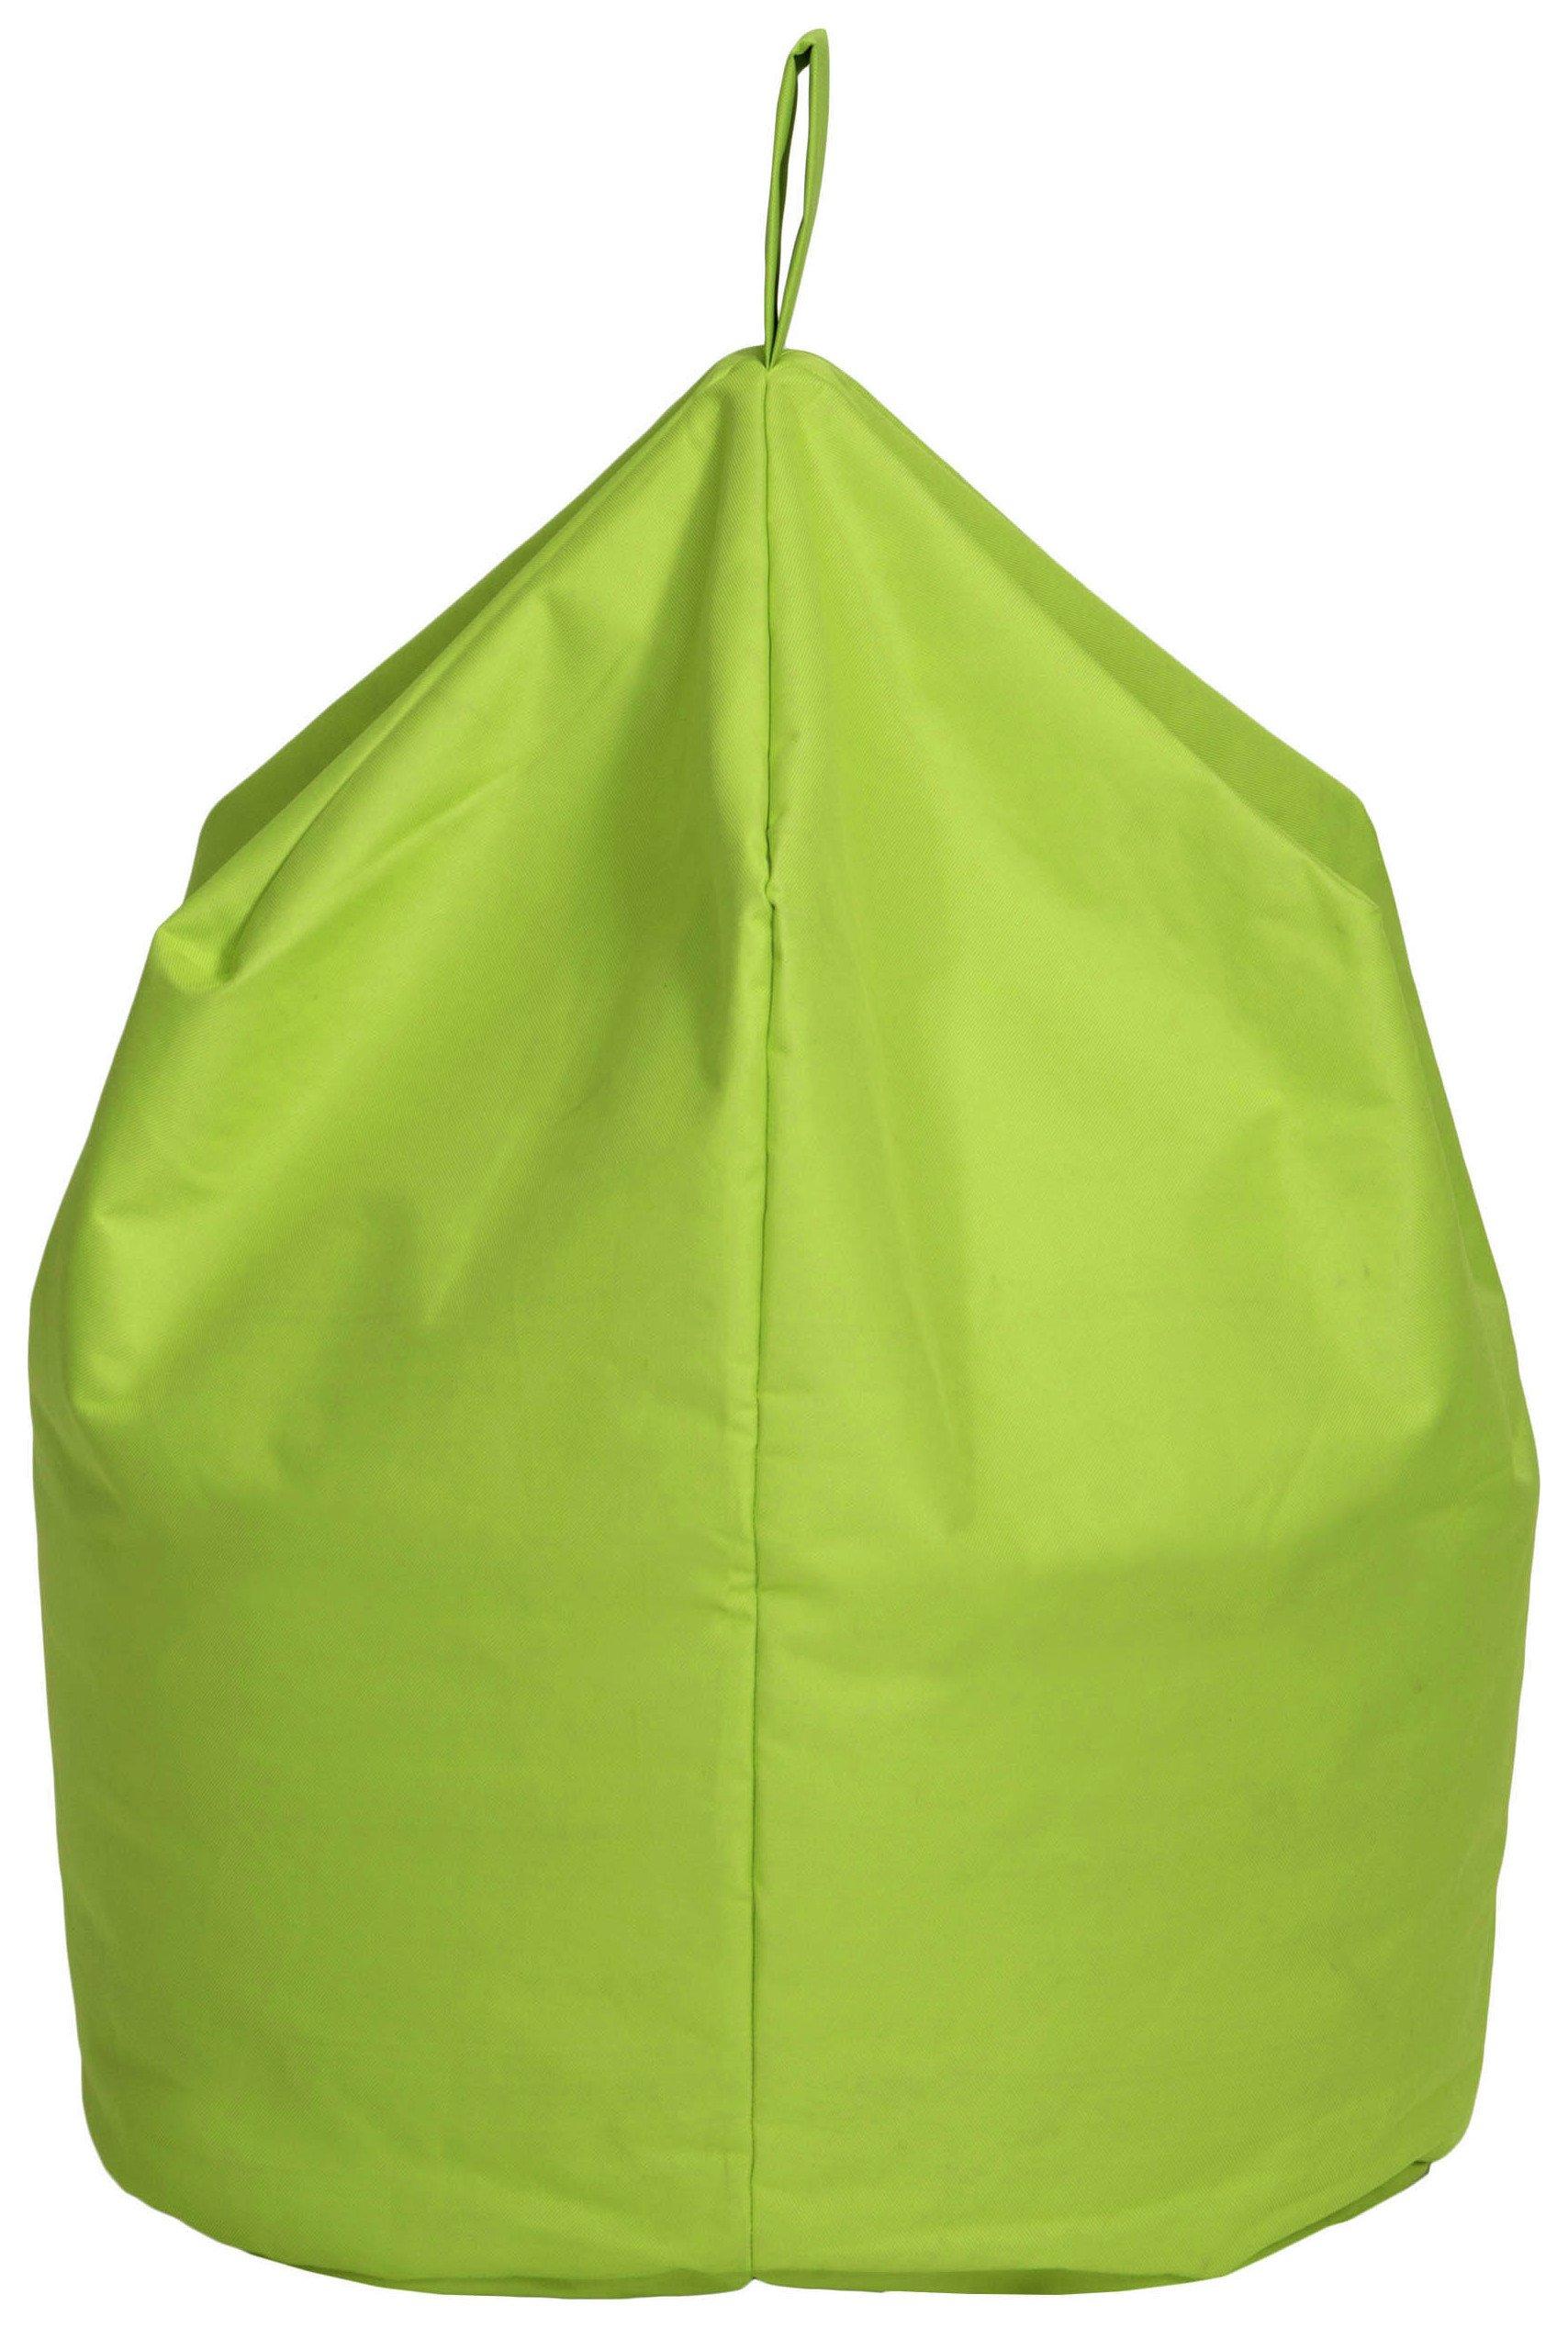 Kaikoo Outdoor Bean Bags - Lime